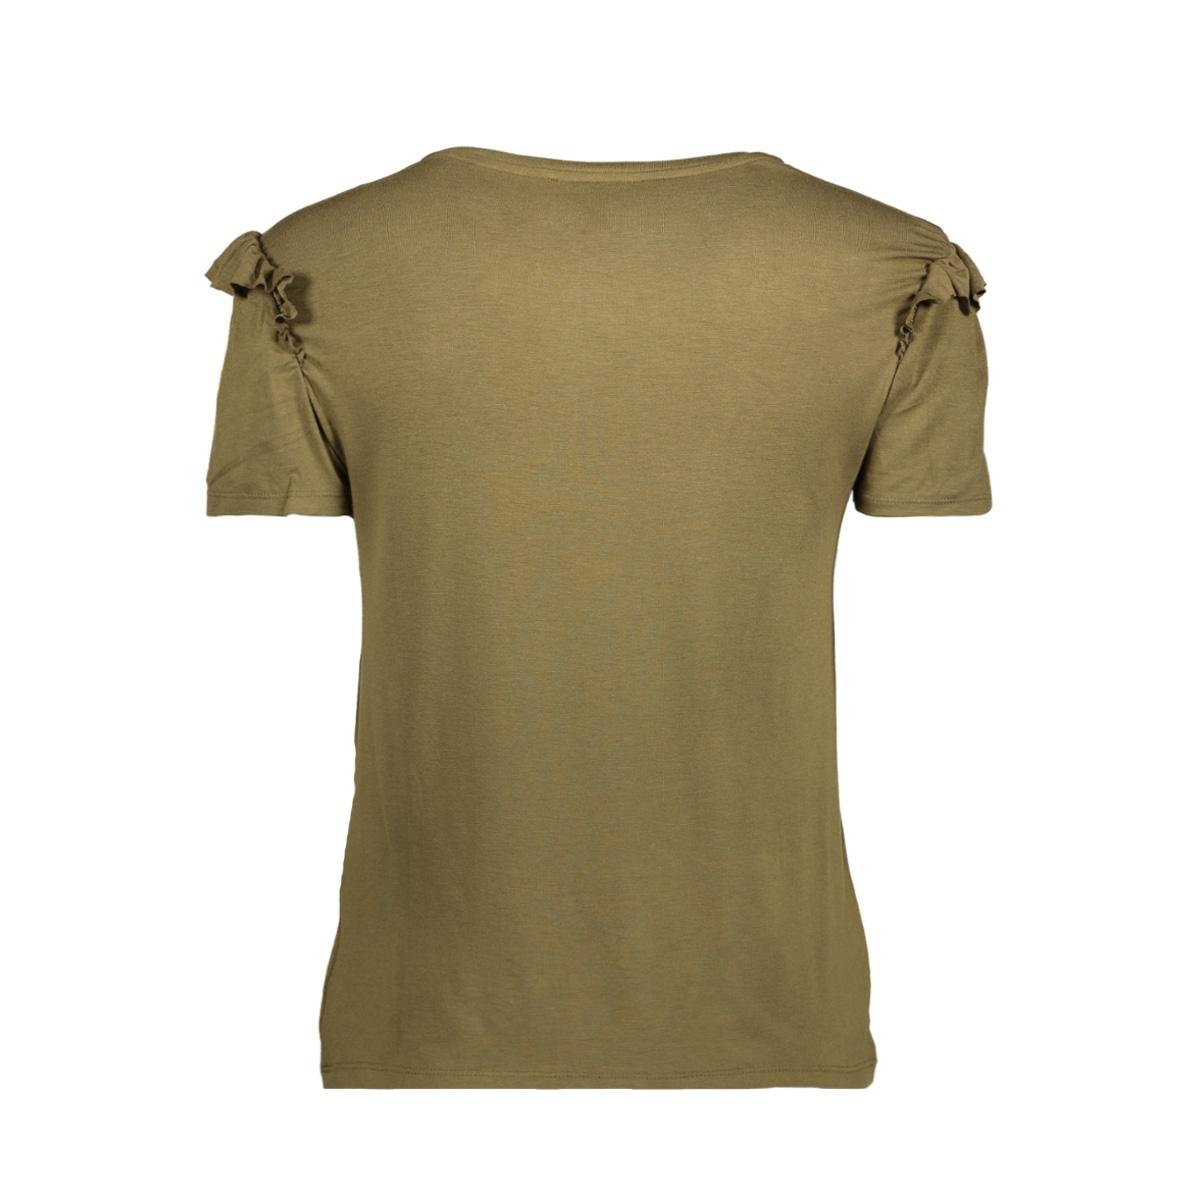 1055053.00.71 tom tailor t-shirt 7537